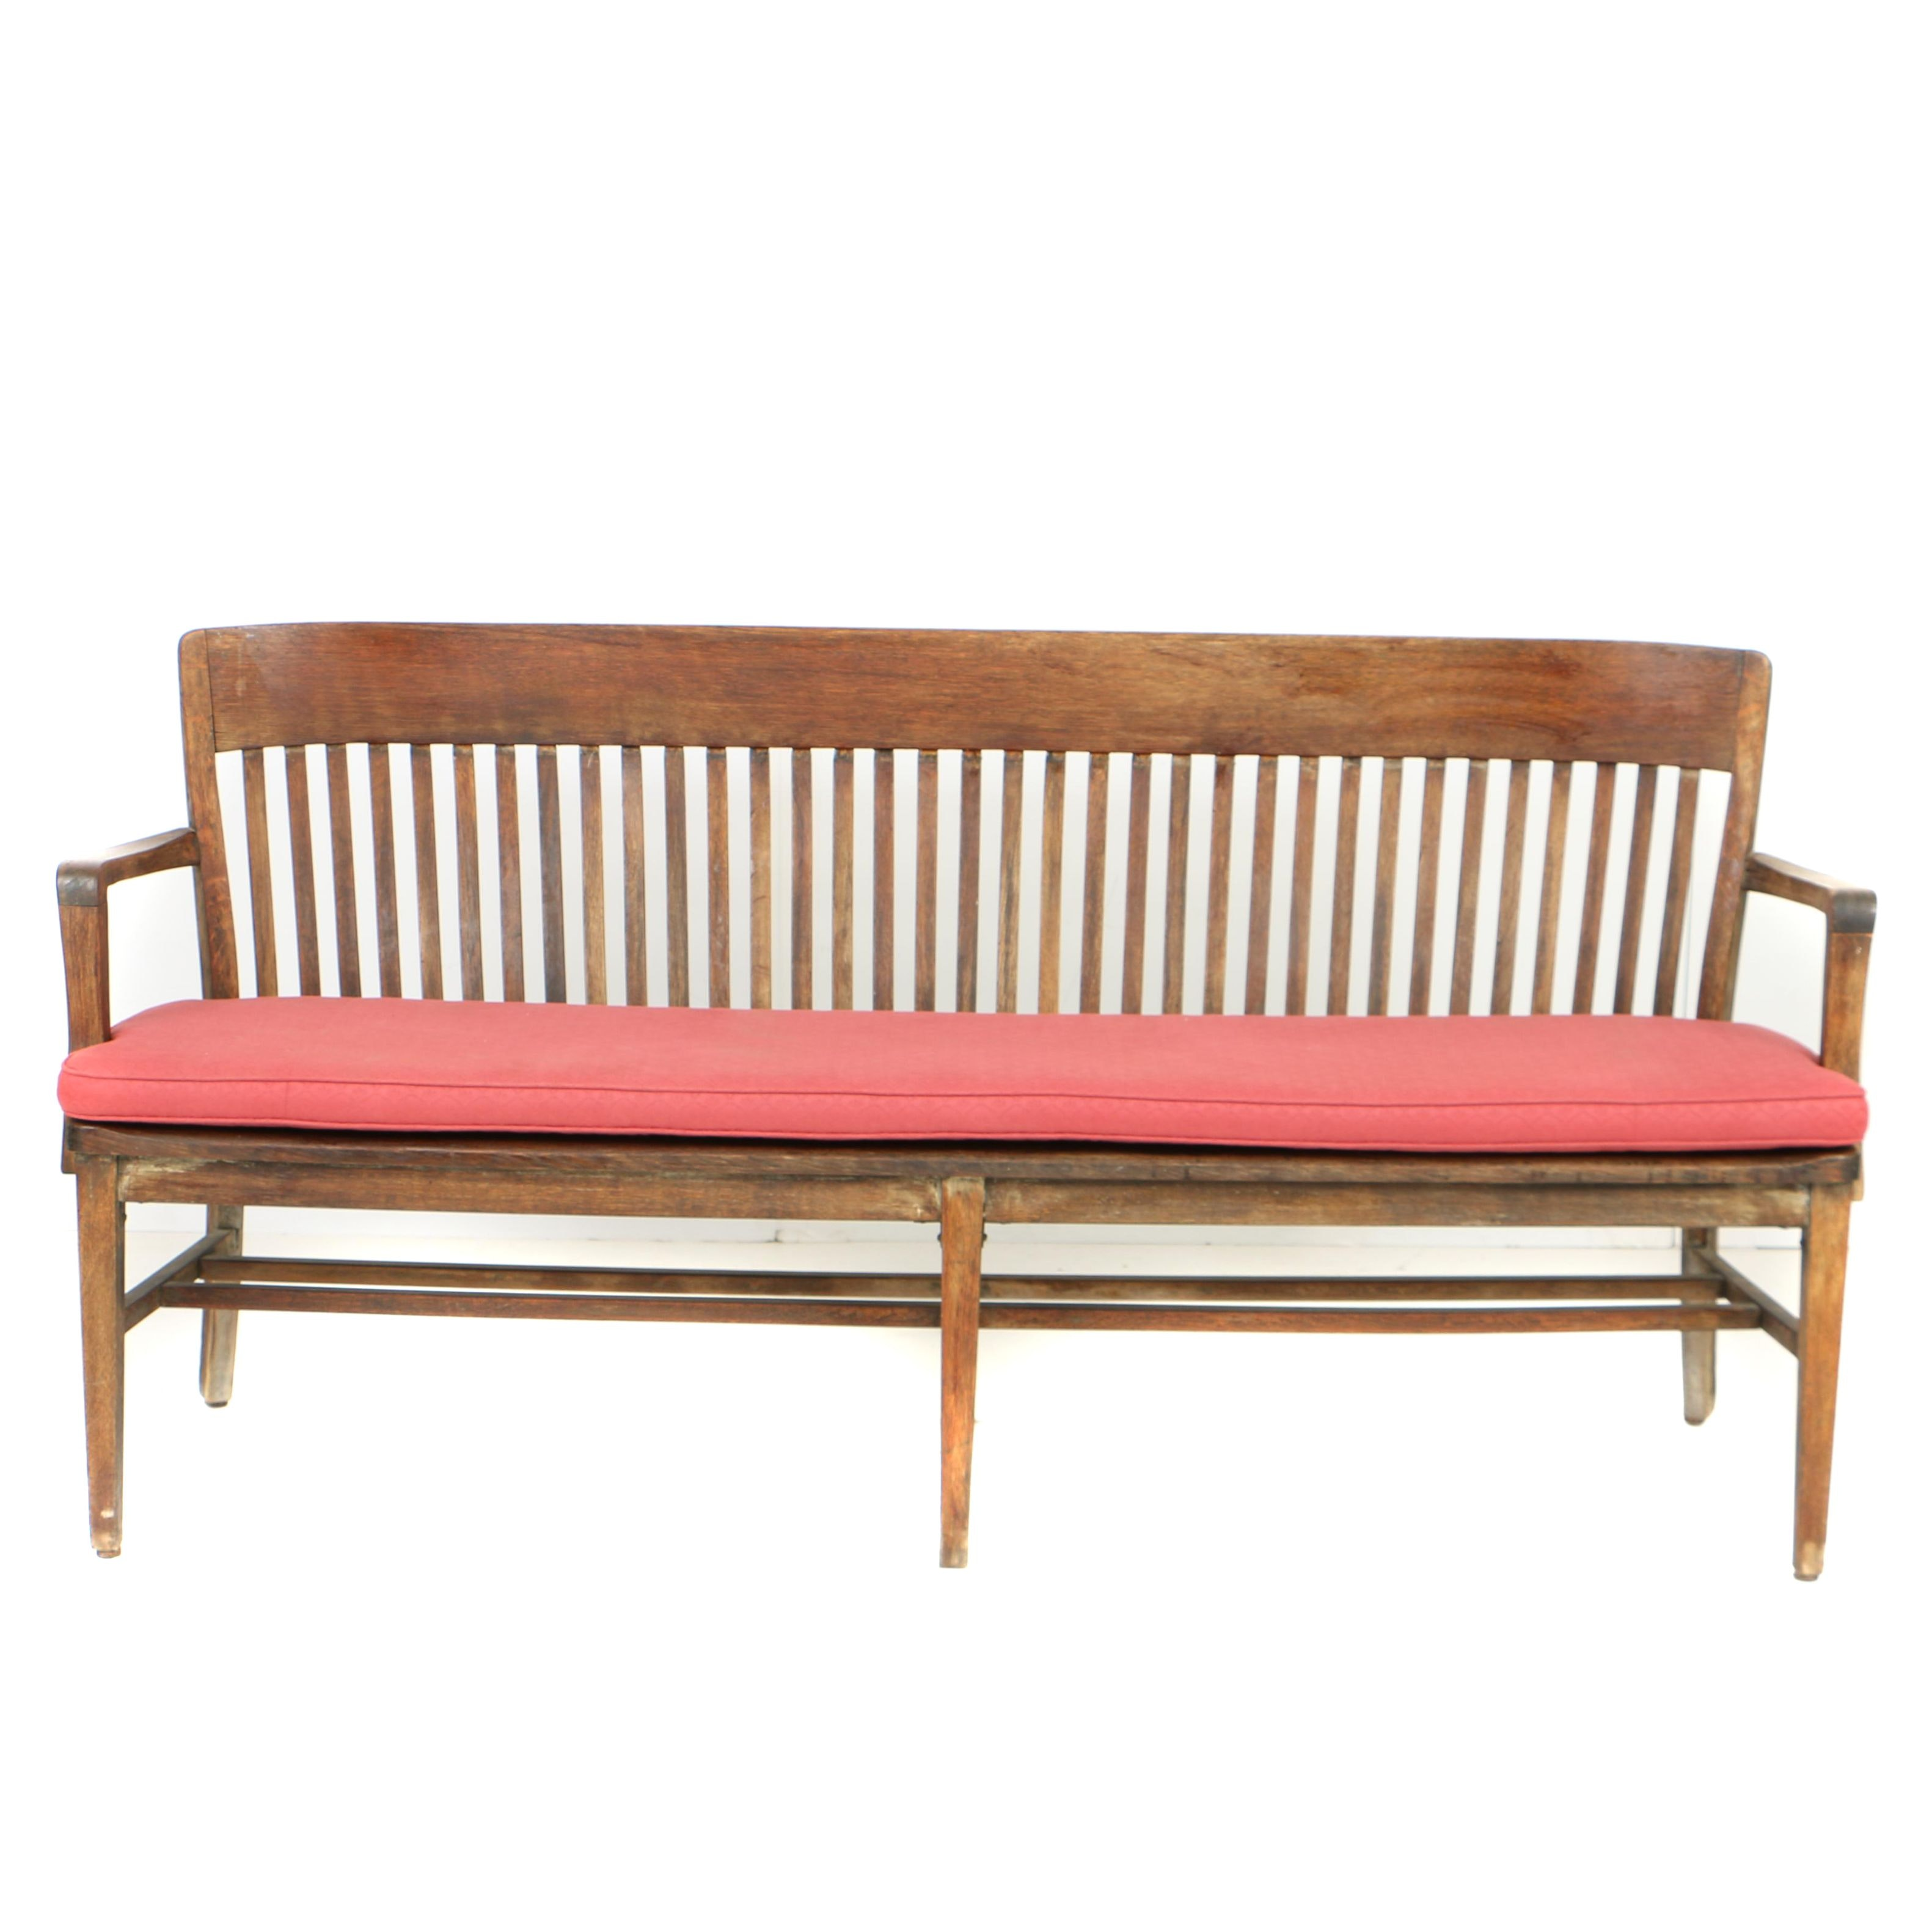 Vintage W.H. Gunlocke Chair Co. Oak Waiting Bench with Custom-Made Cushion